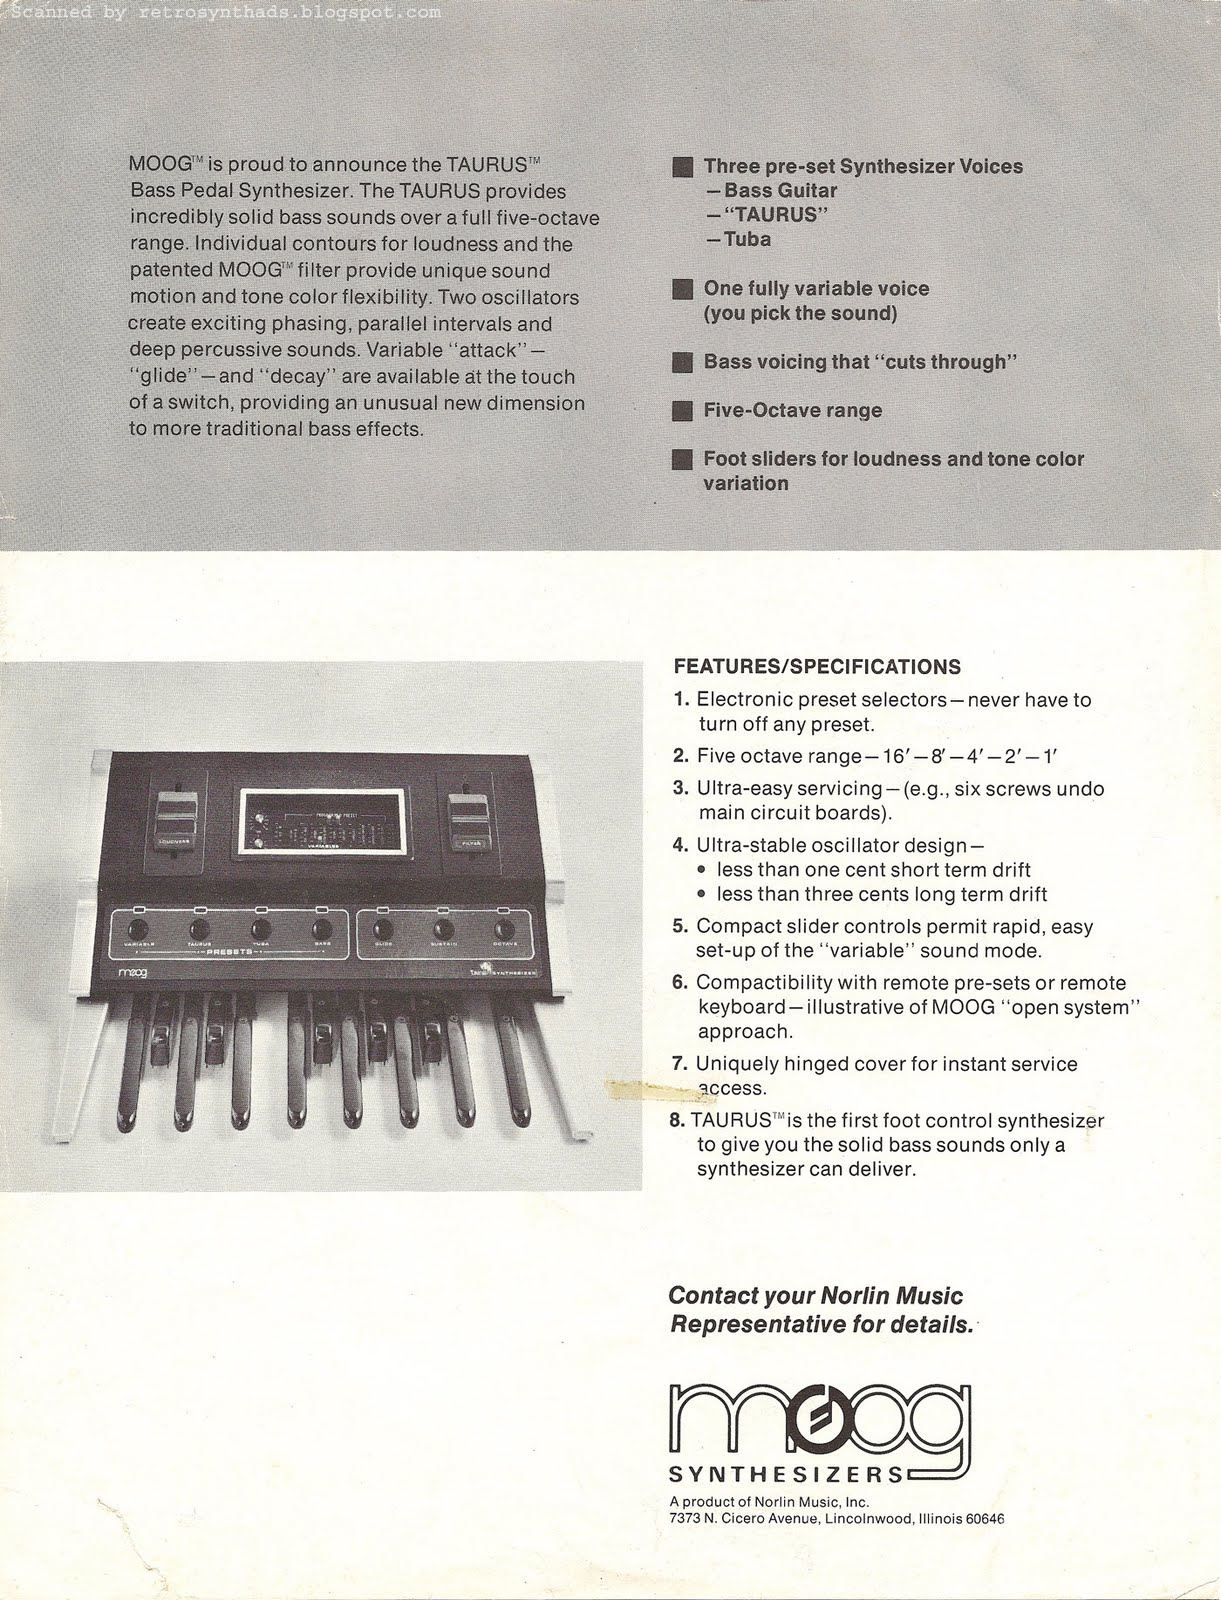 moog_taurus_broch_74_back retro synth ads moog taurus bass pedal synthesizer (aka taurus 1 2008 Taurus Wiring Diagram at bakdesigns.co